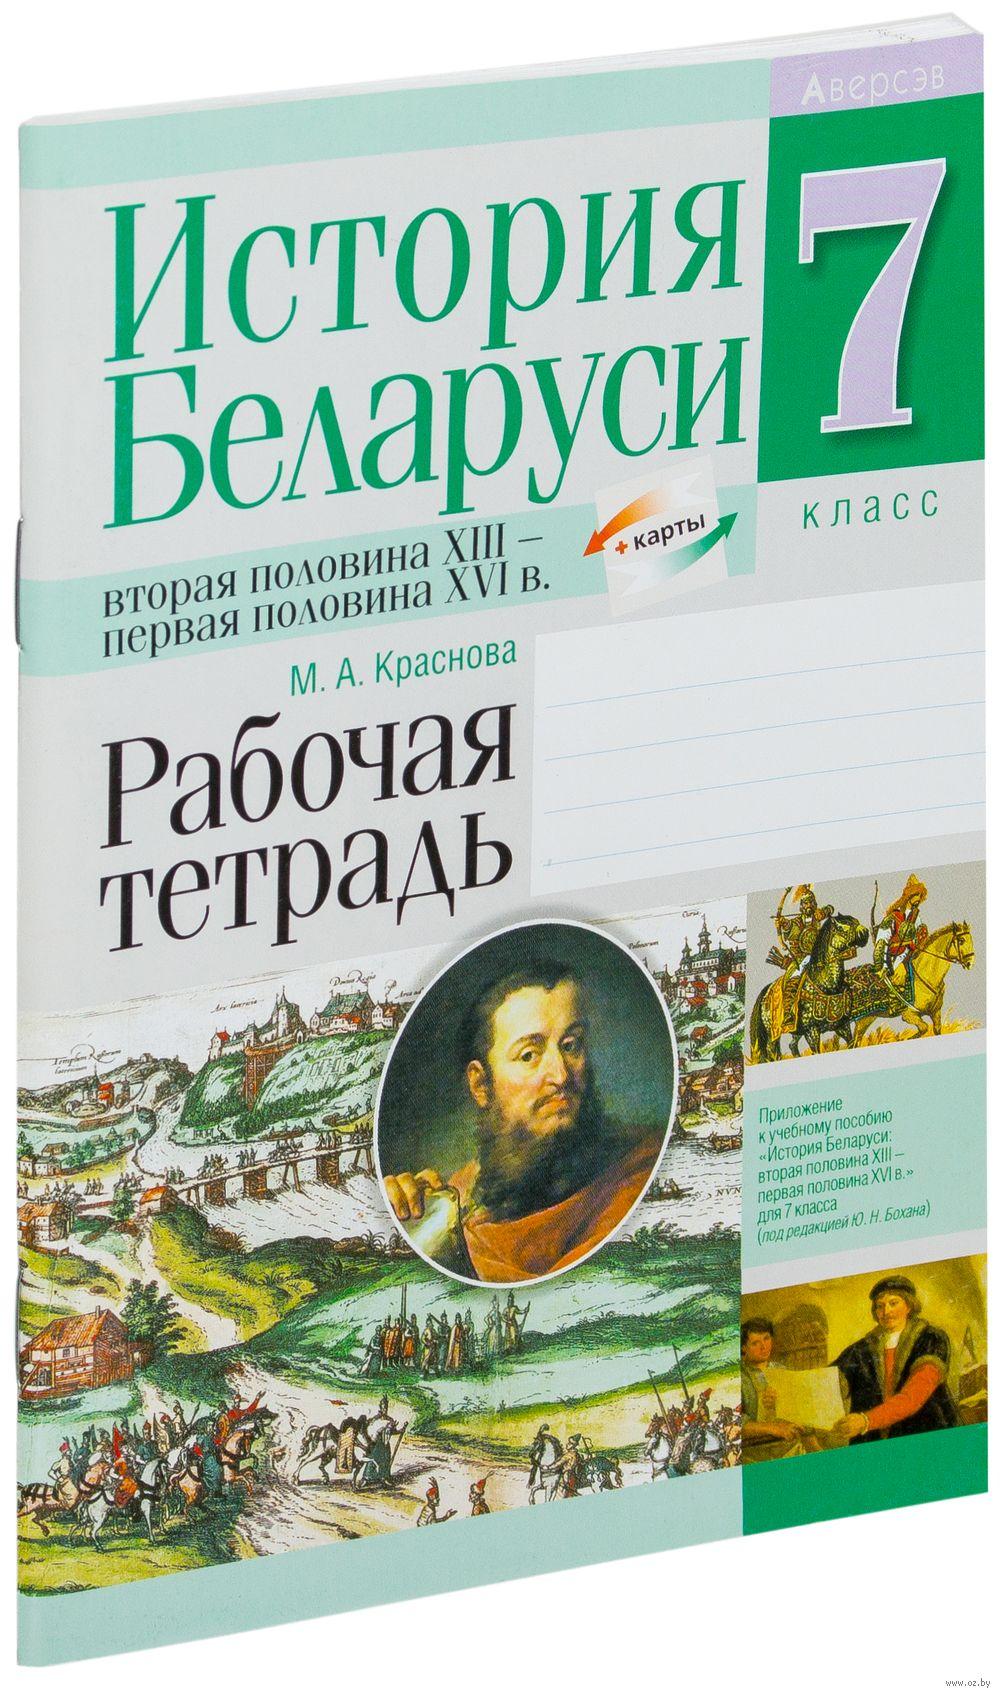 Решебник для контурных карт истории беларуси 7 класс templatesofis.